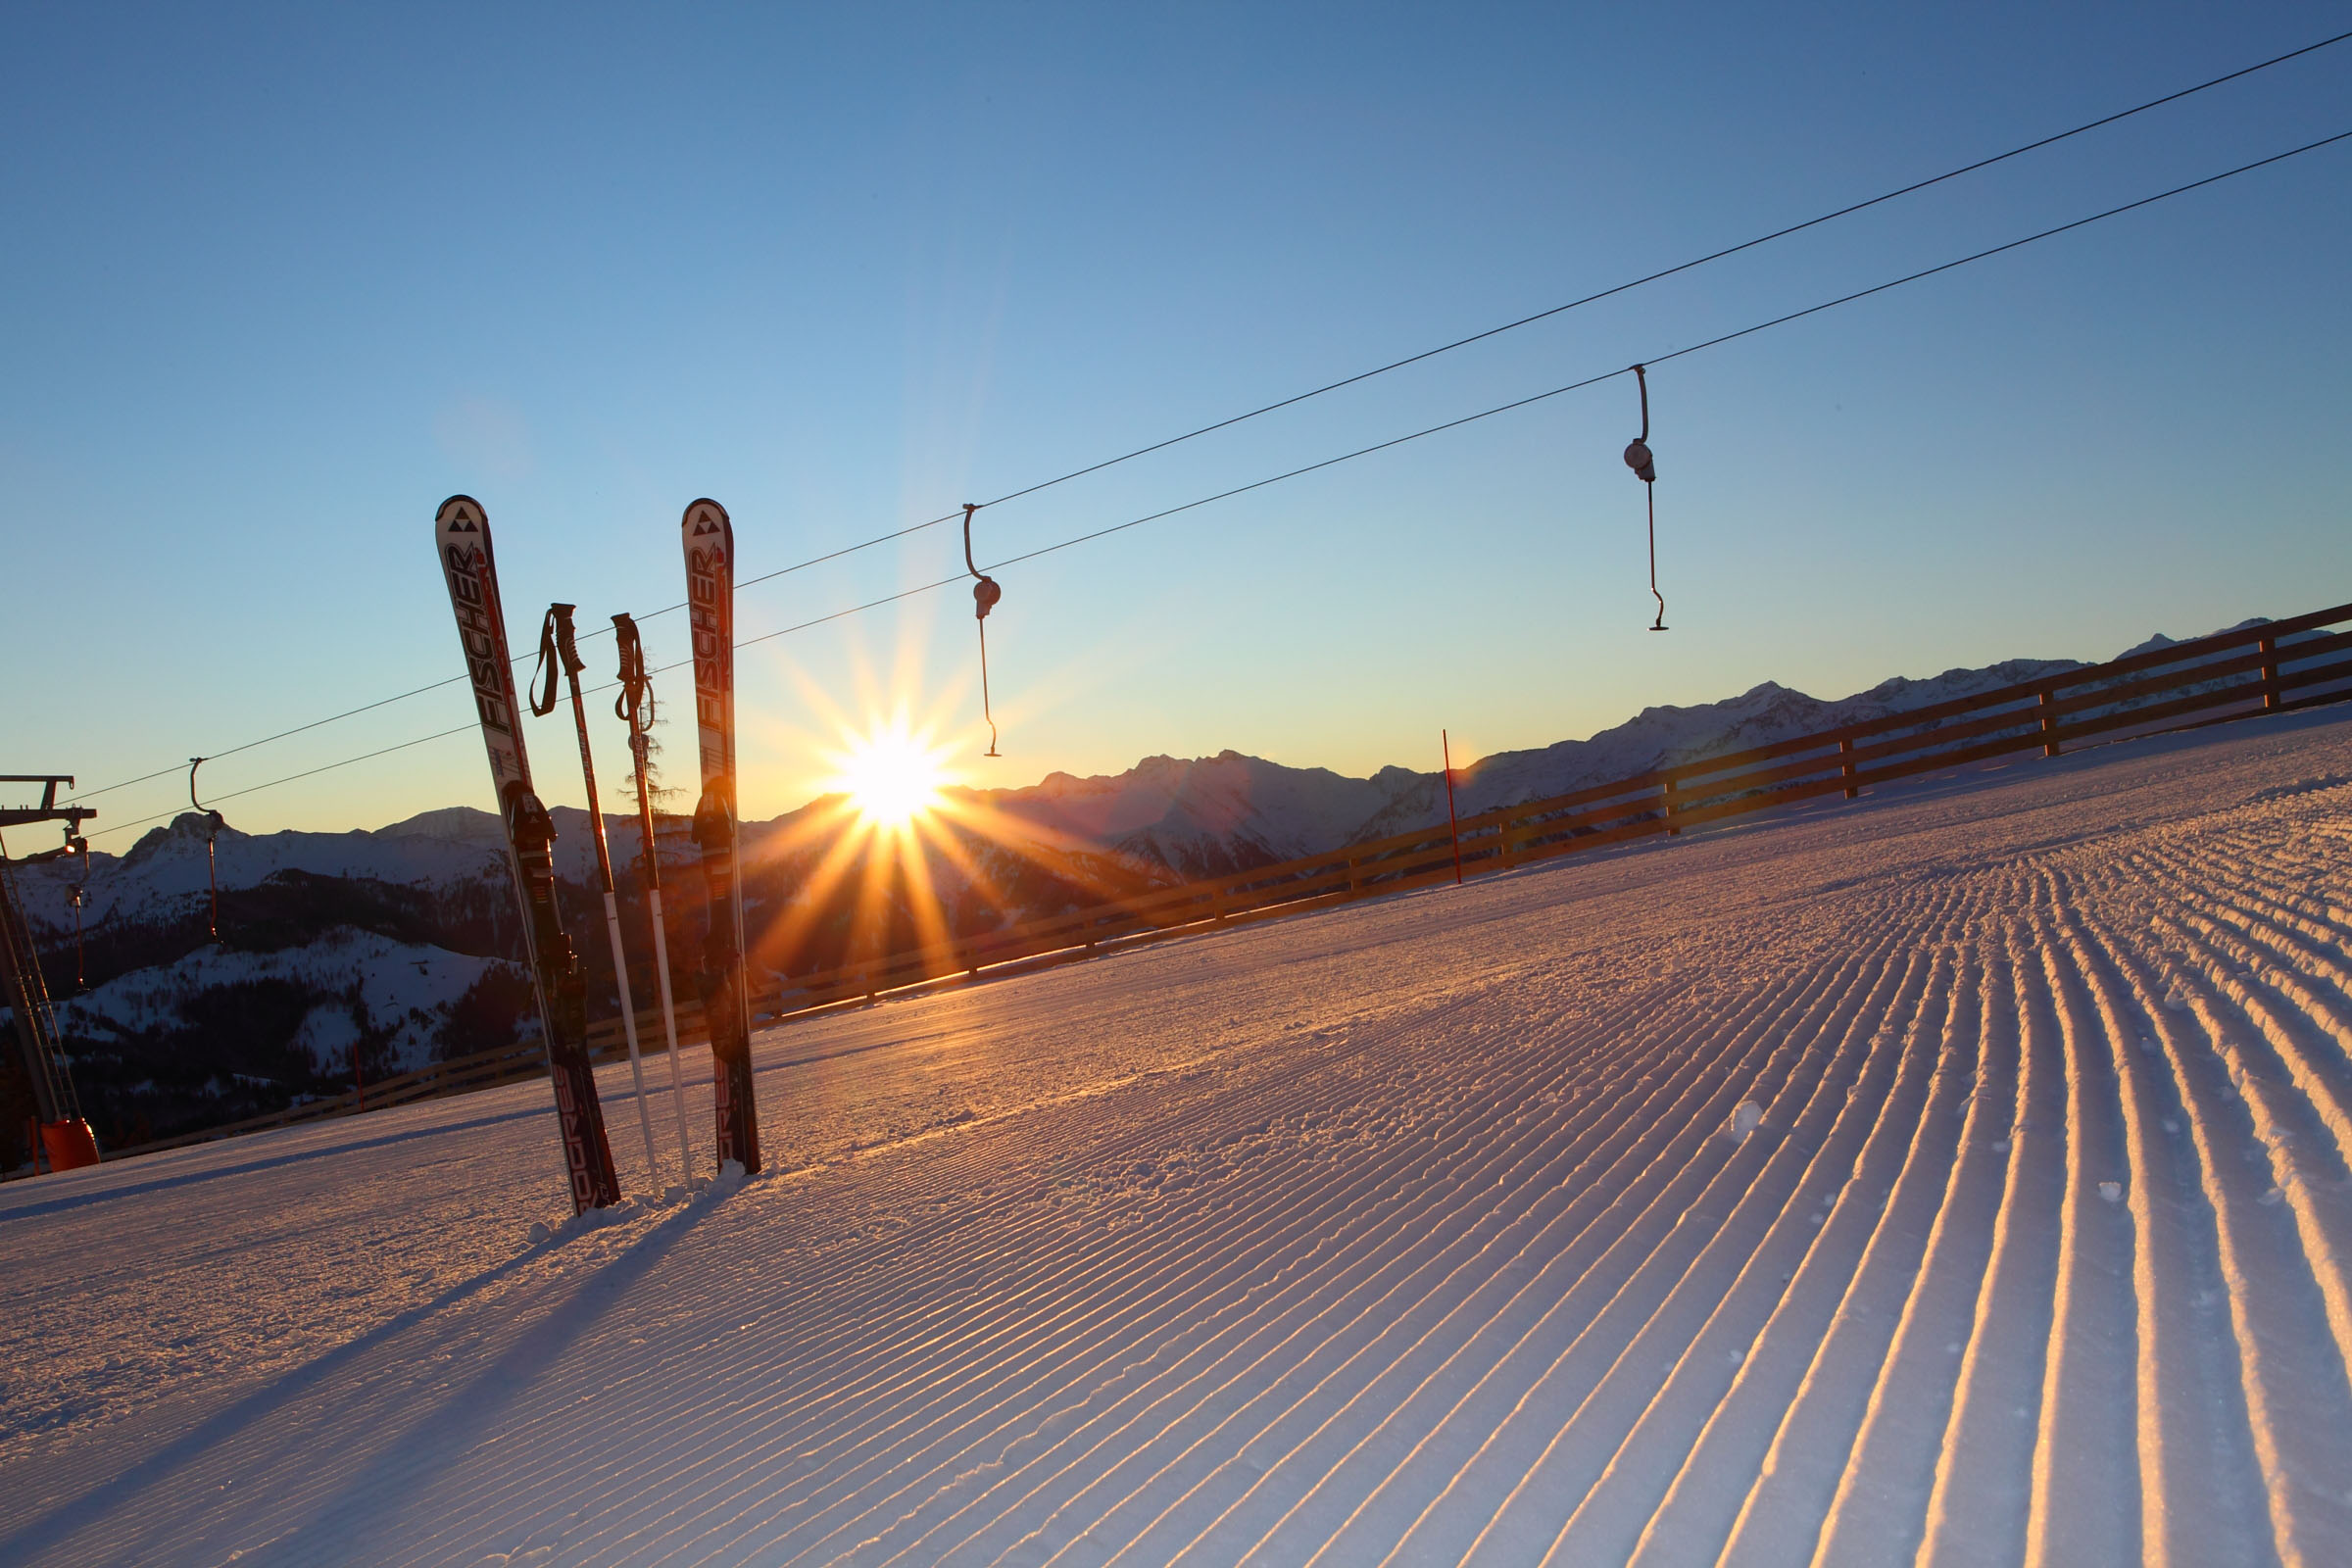 ferienhaus-grabenhaeusl-sonnenaufgang-grossarltal-skigebiet